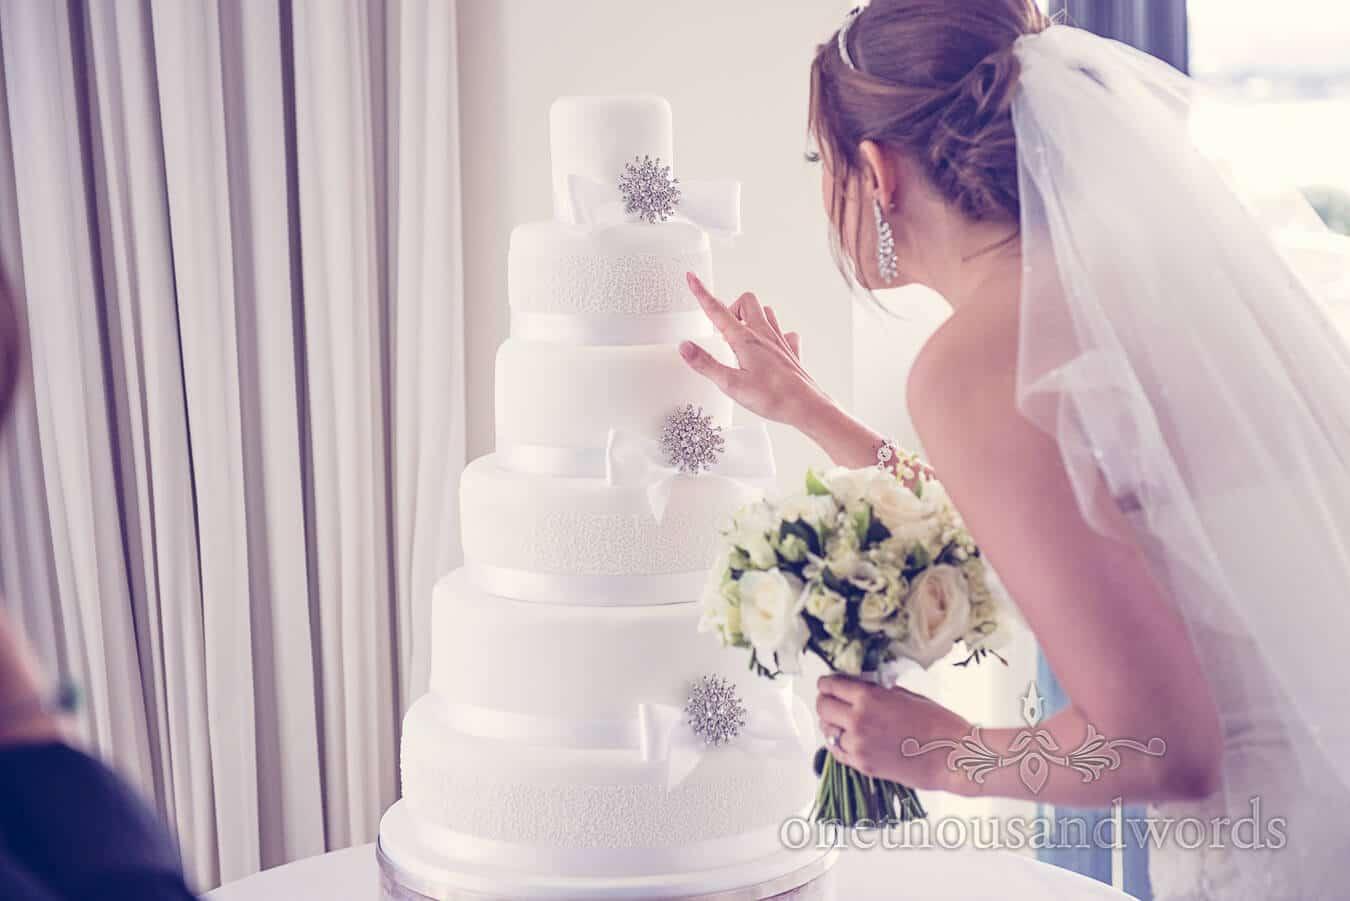 Bride inspects white wedding cake at Poole wedding venue